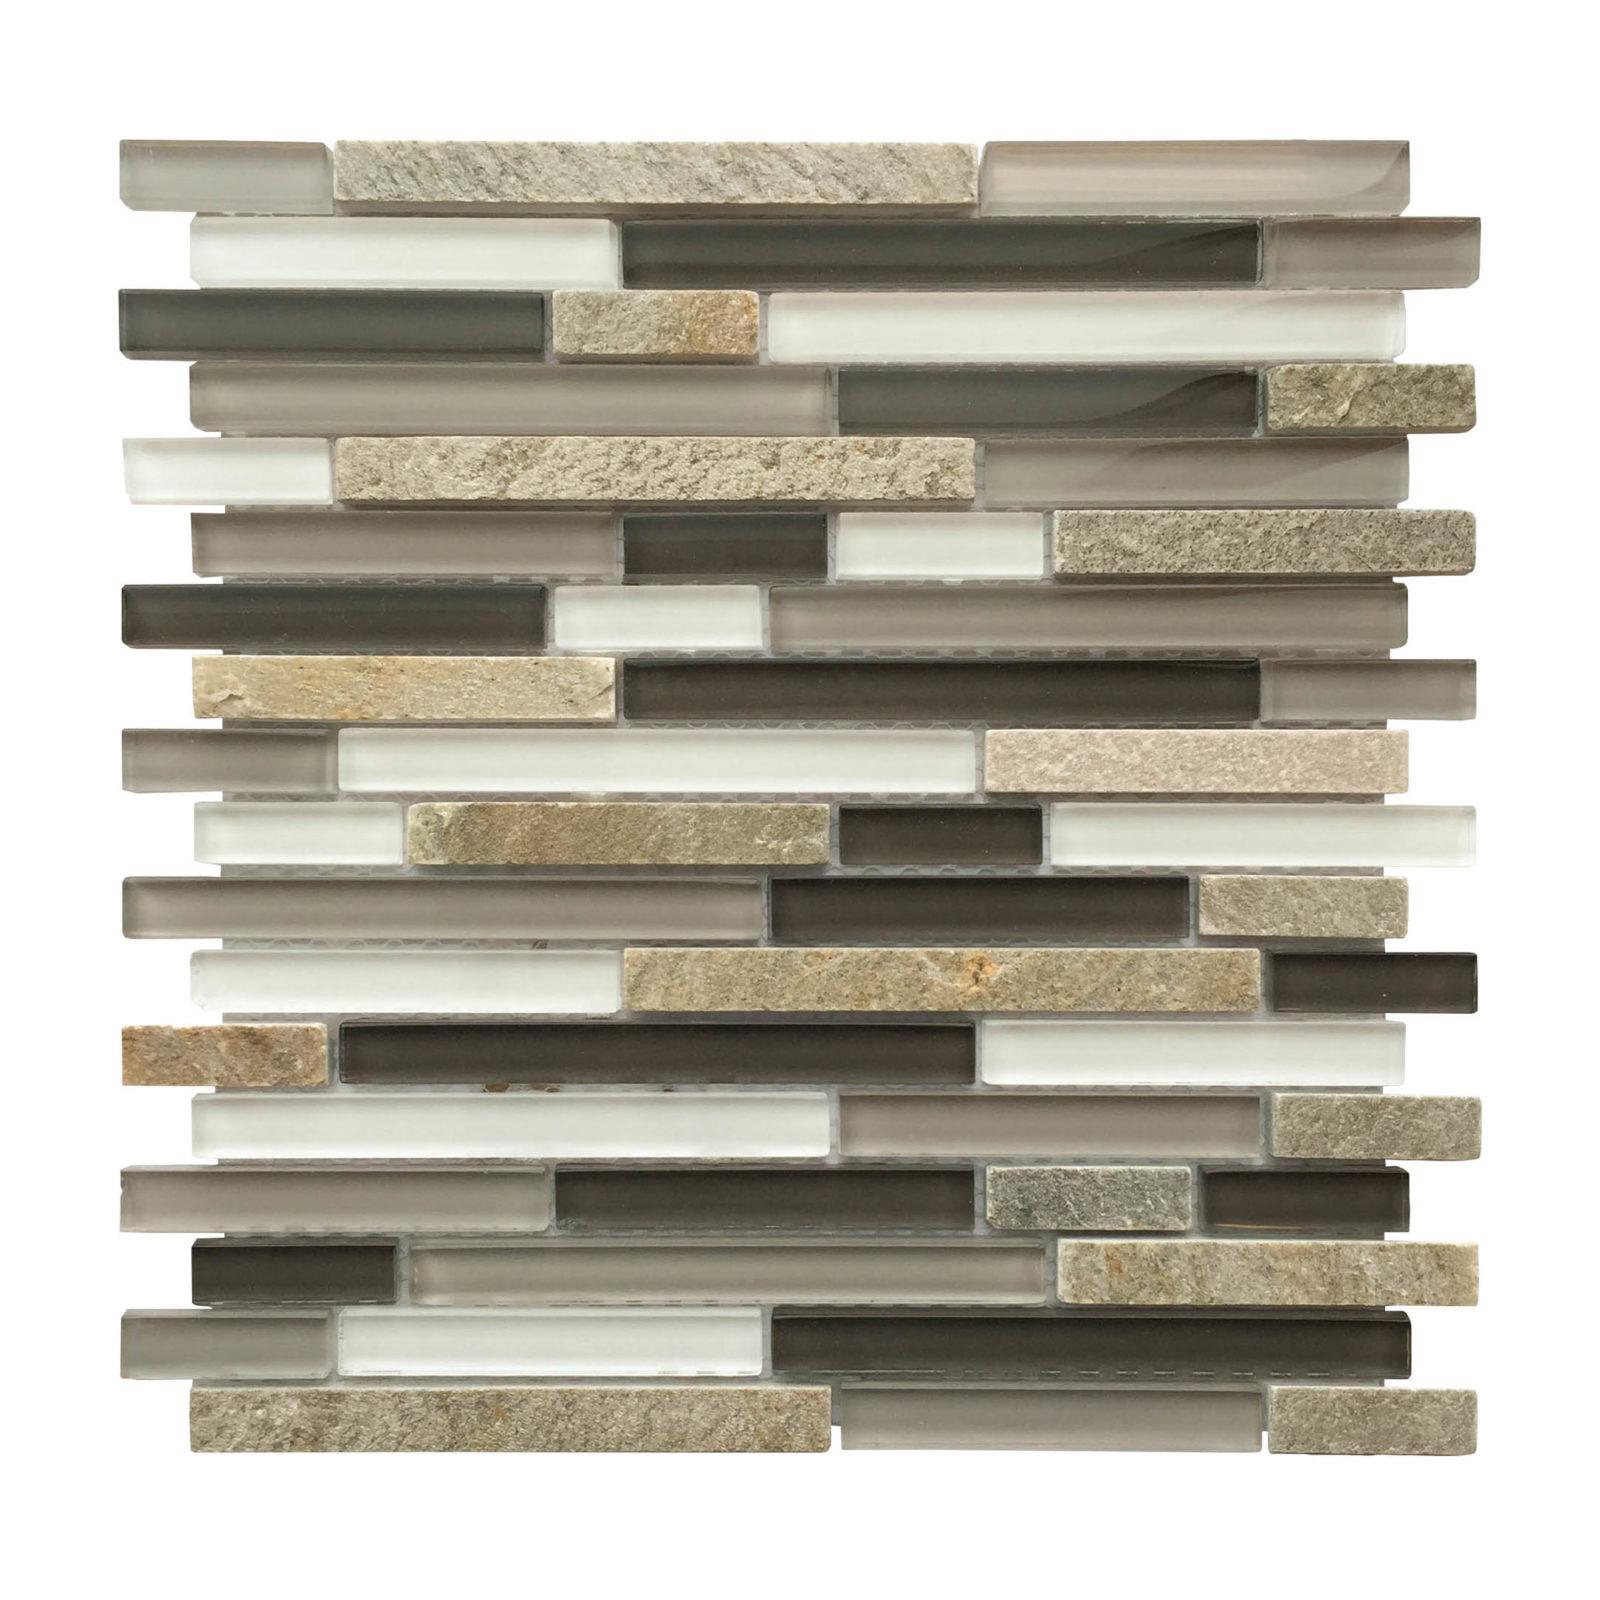 al2304 slate stone gray glass linear 12 x 12 mosaic